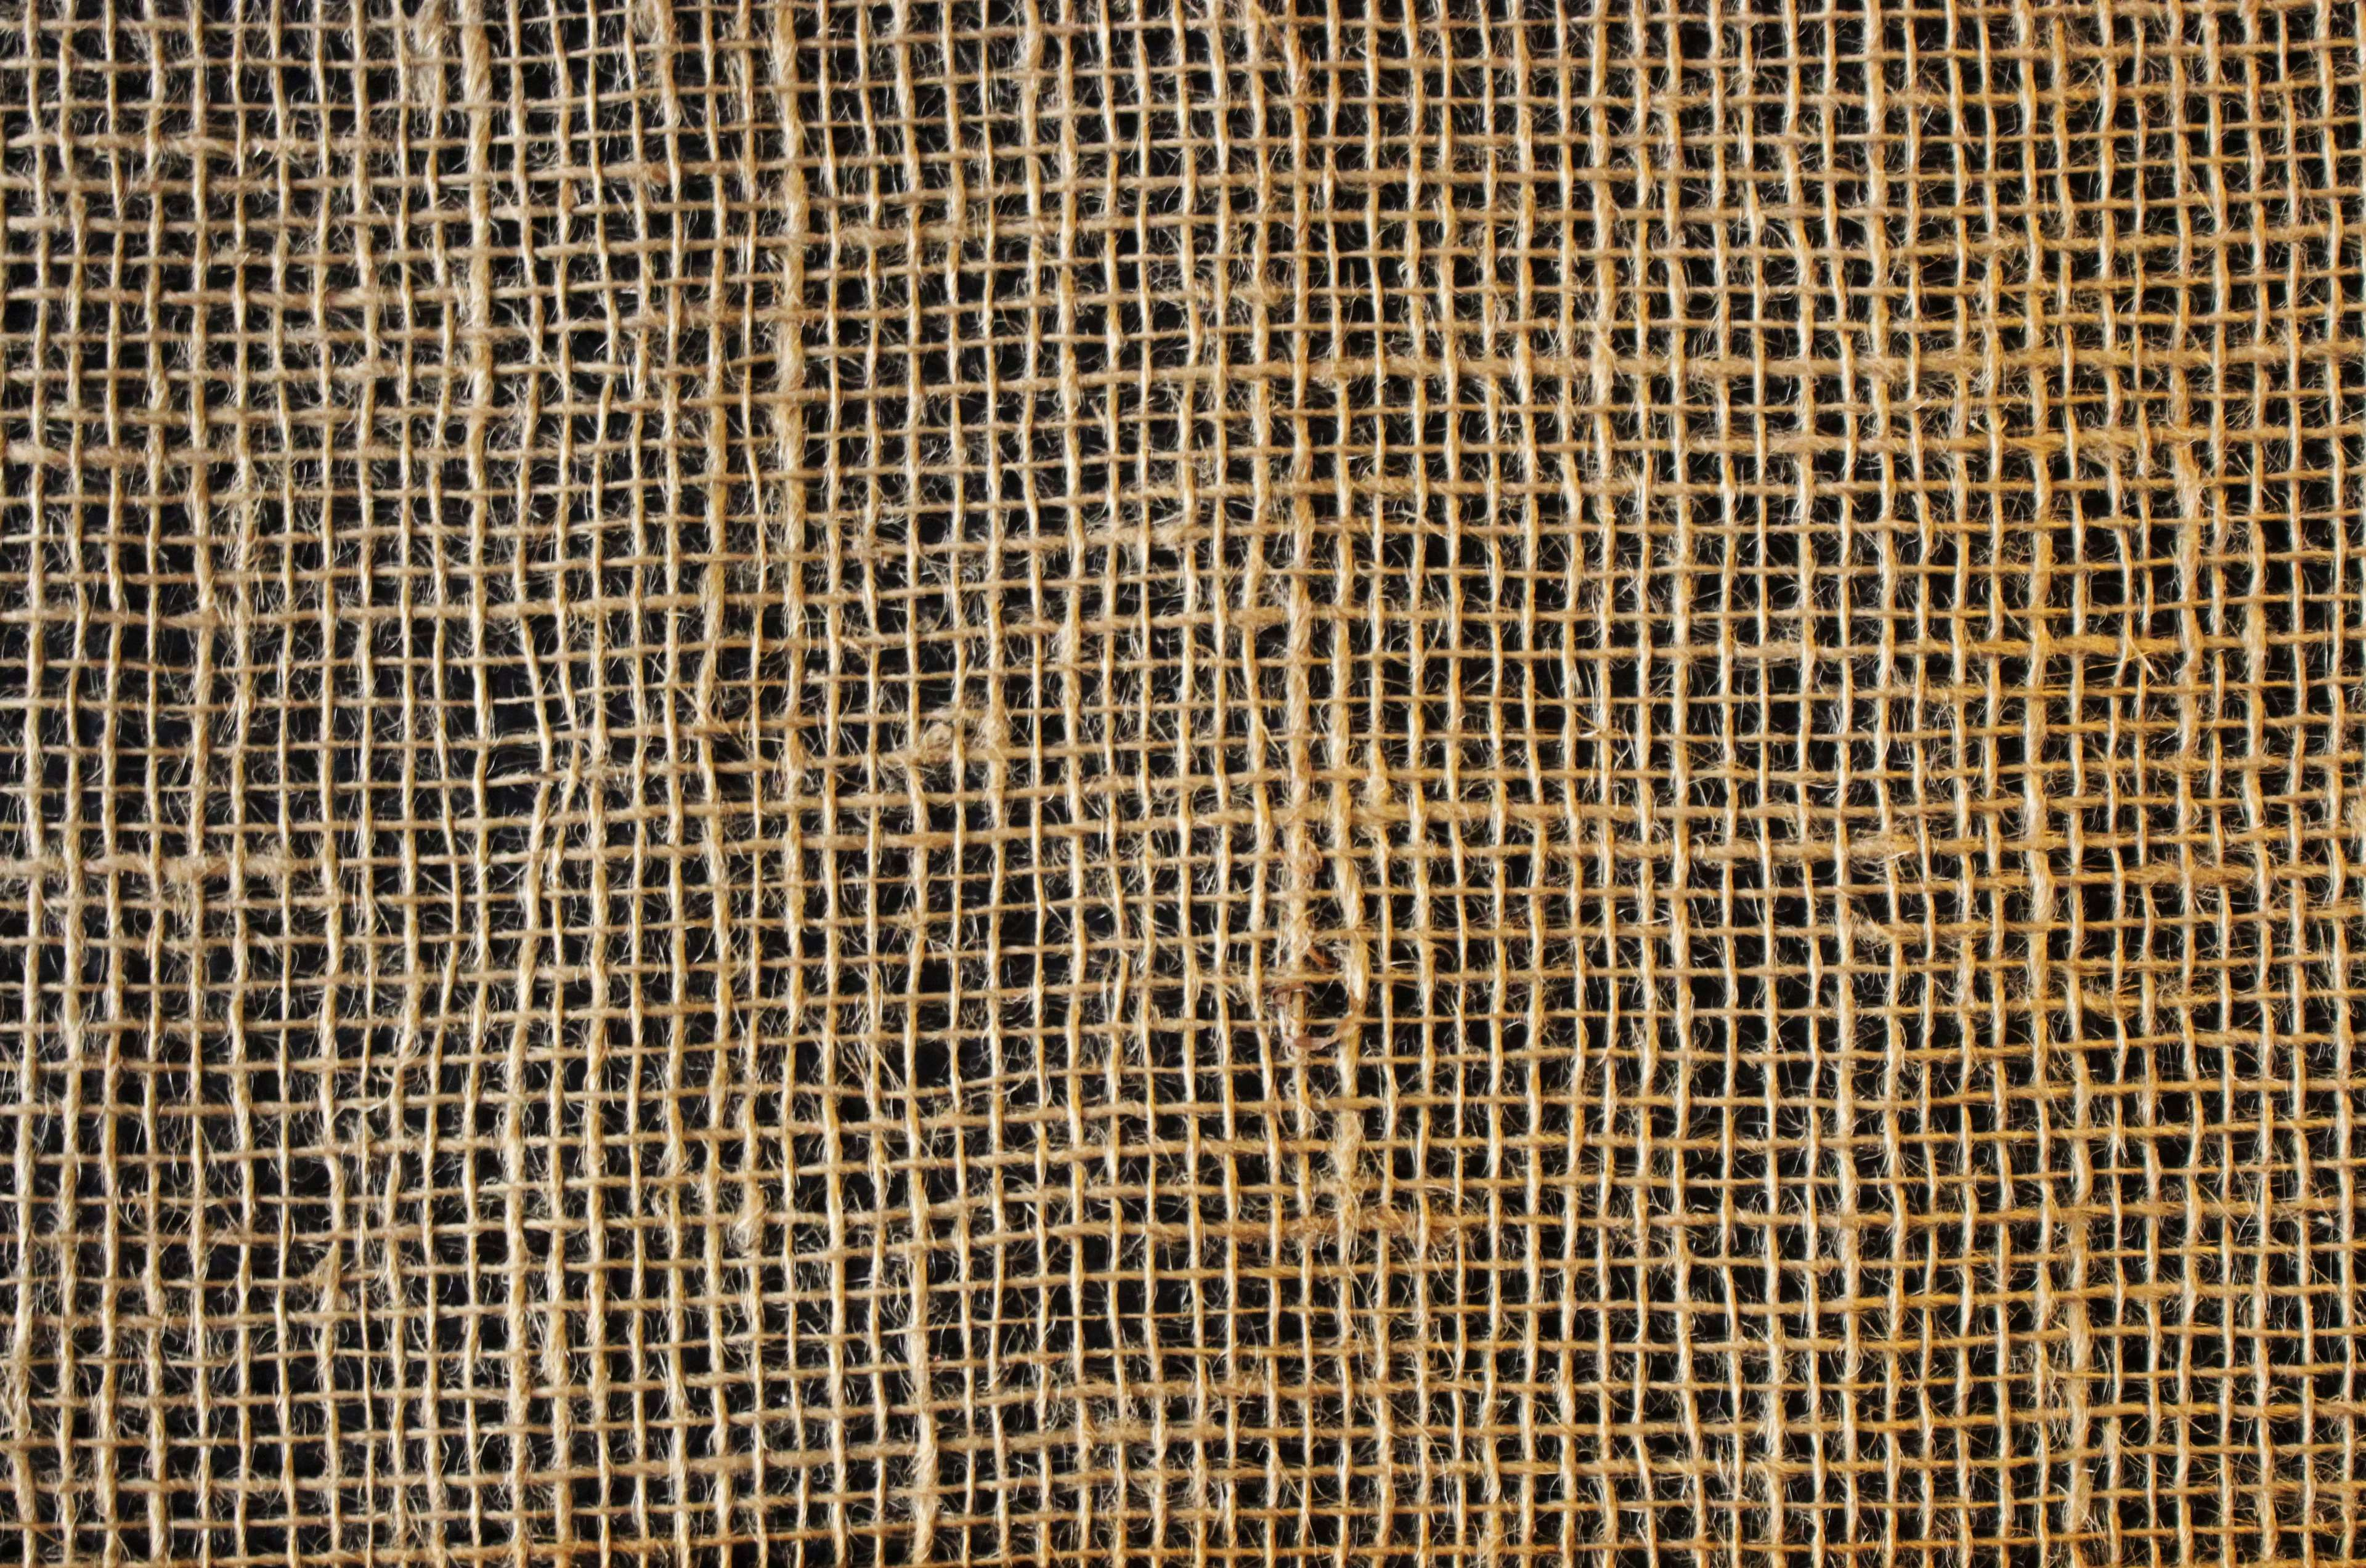 Aged Backdrop Bag Beige Brown Burlap Canvas Cloth